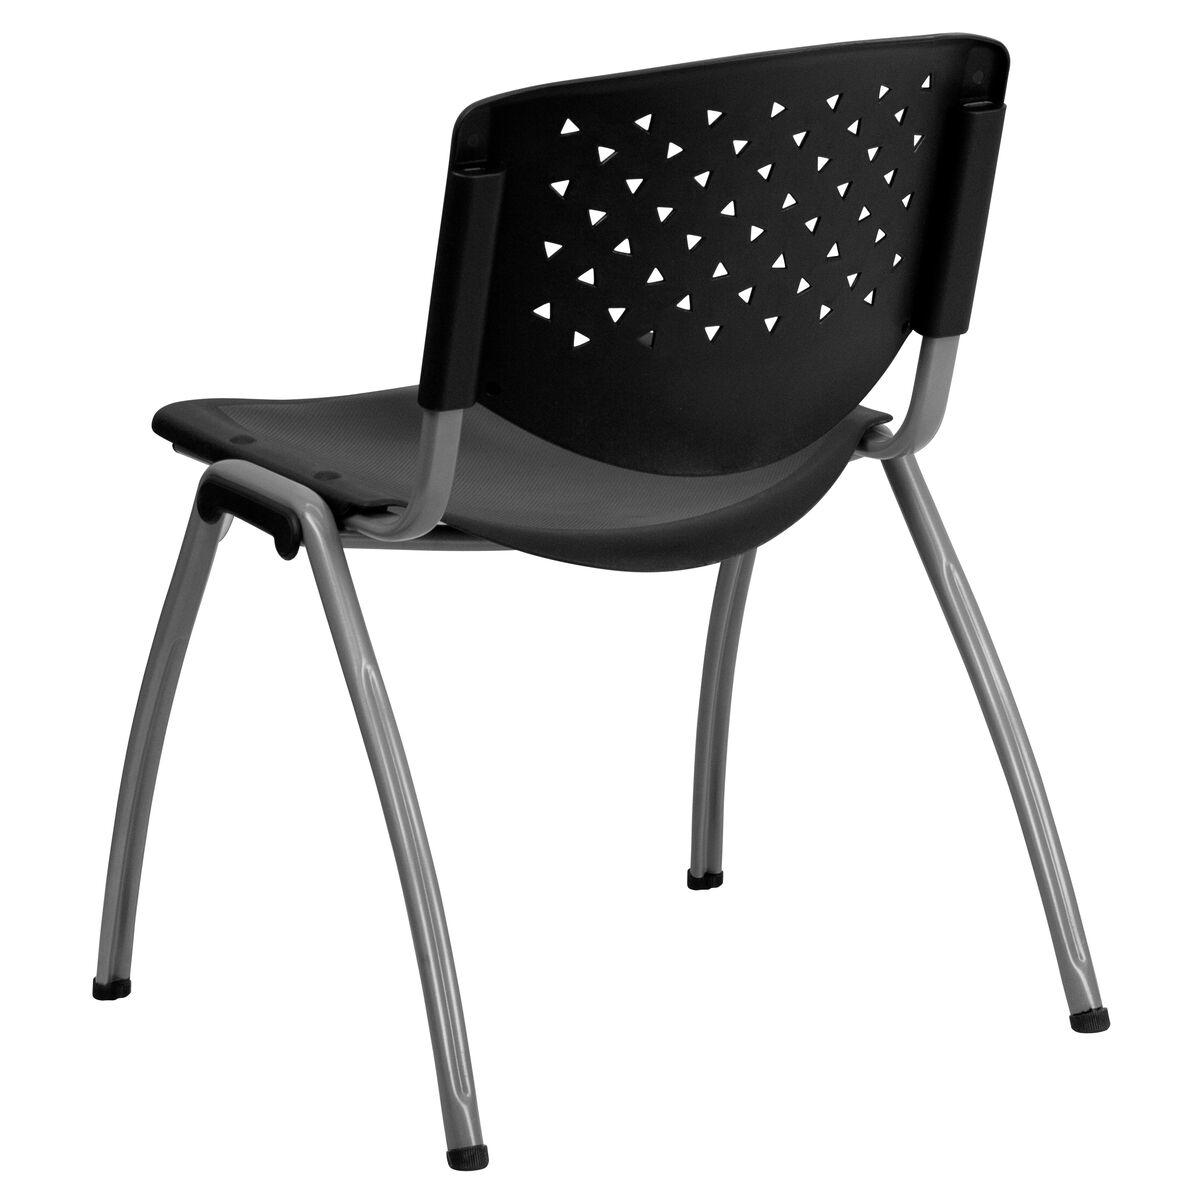 black plastic stack chair rut f01a bk gg. Black Bedroom Furniture Sets. Home Design Ideas